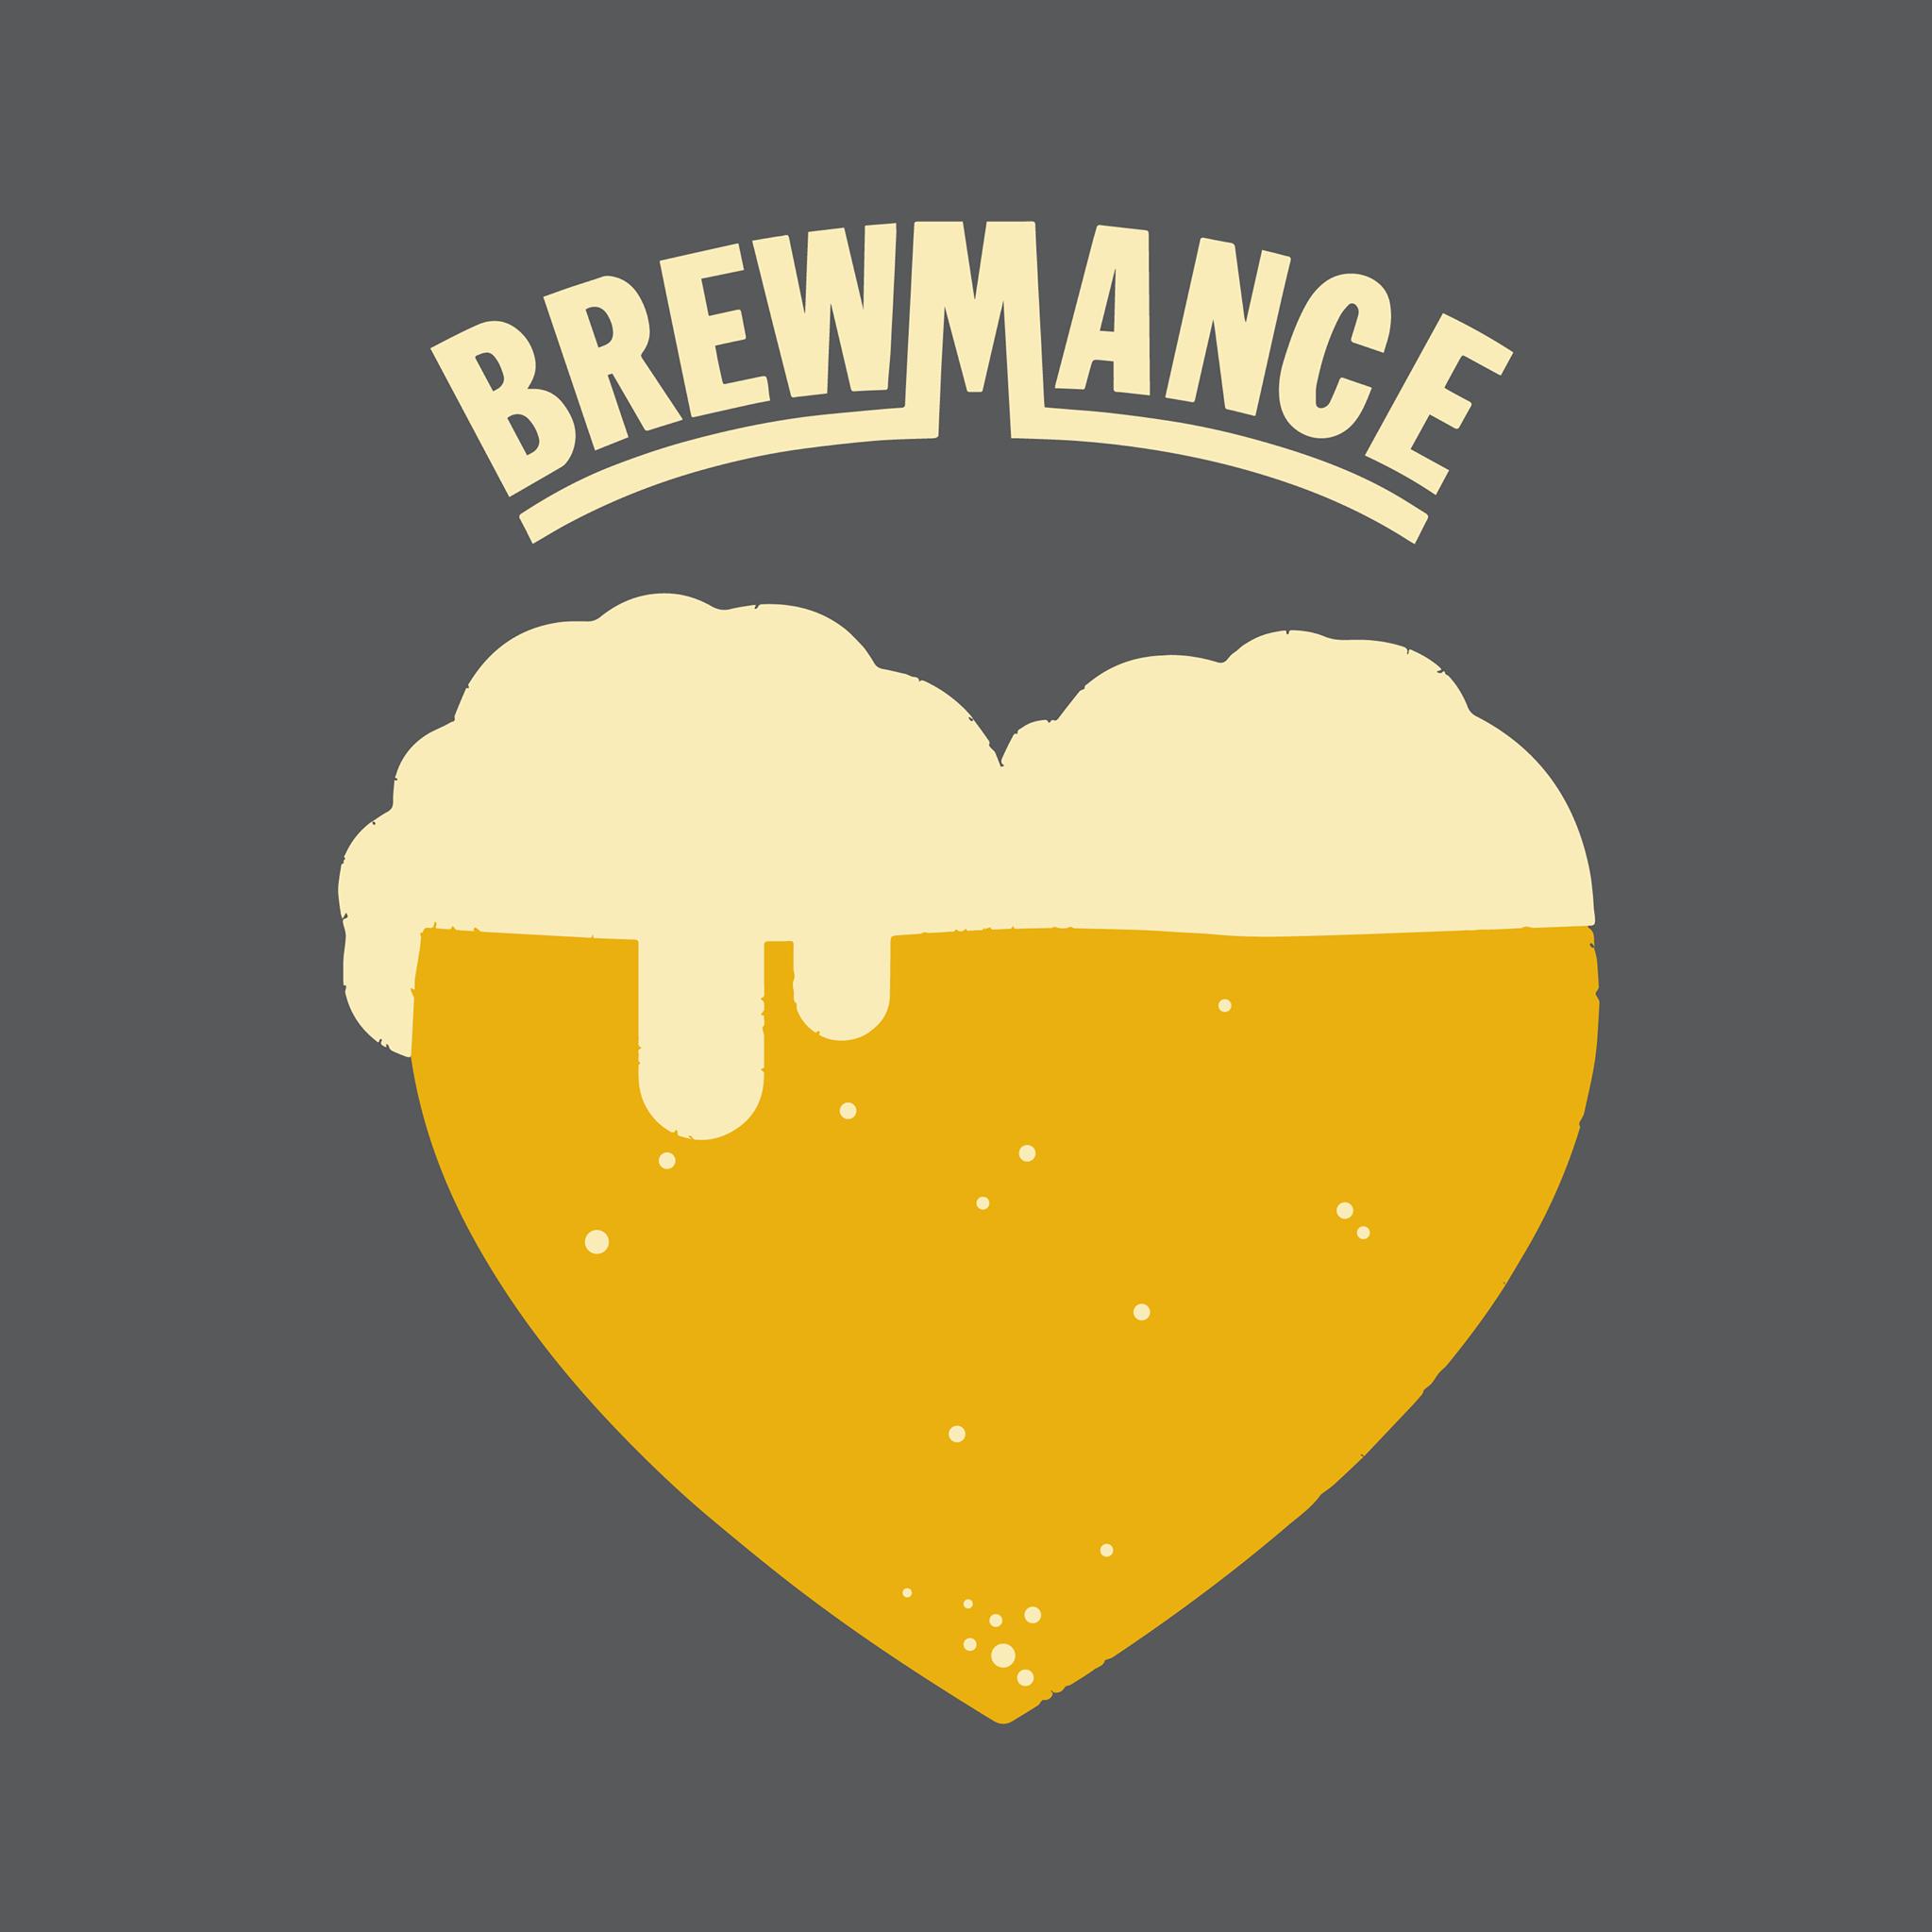 Brewmance